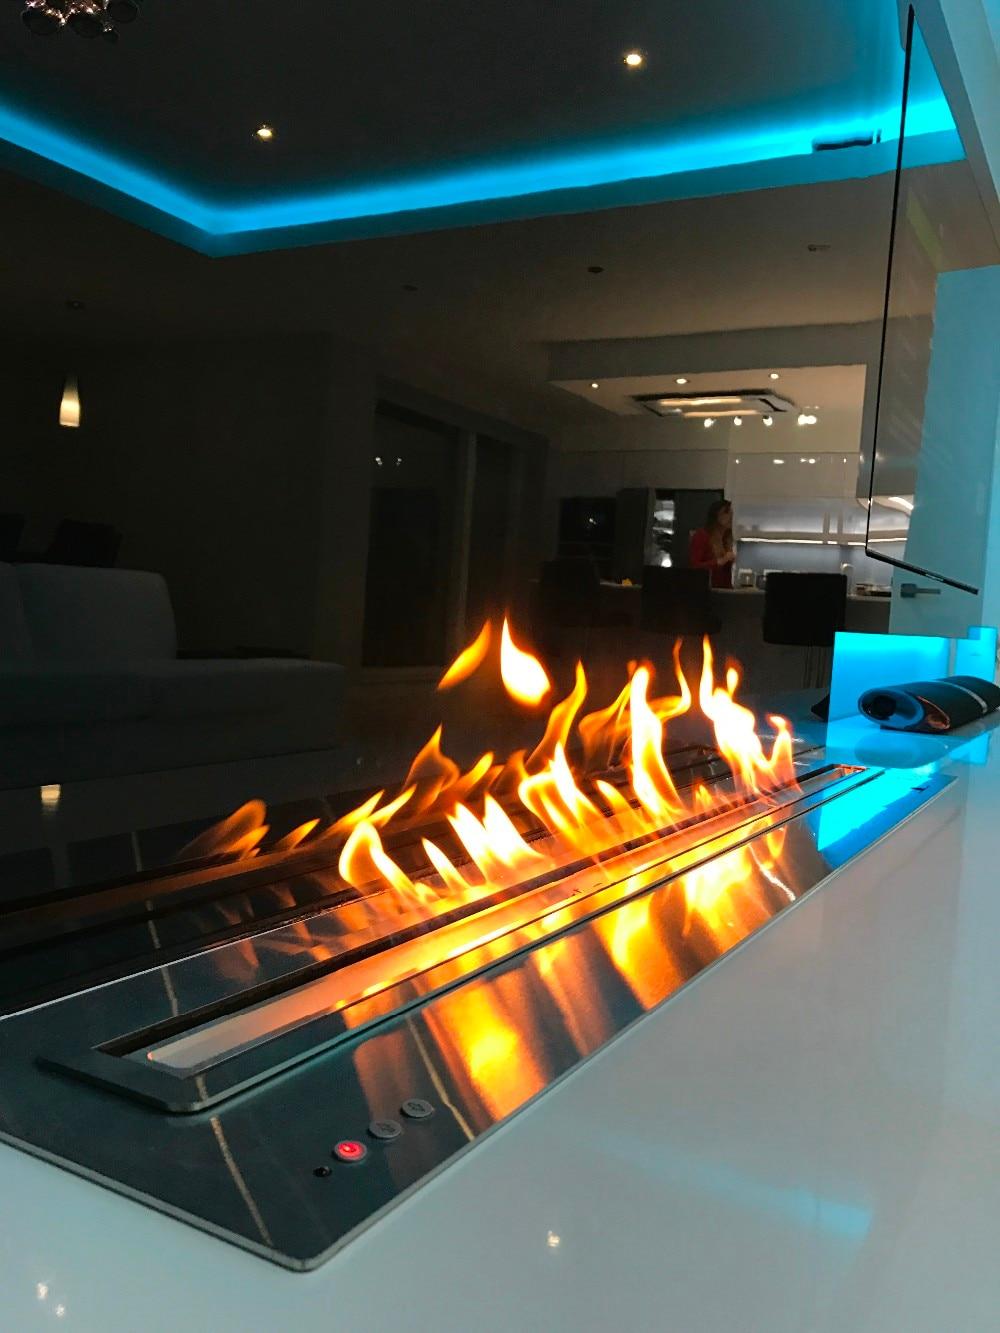 Hot Sale Quemador Bioetanol 48 Pulgadas Firepits Indoor